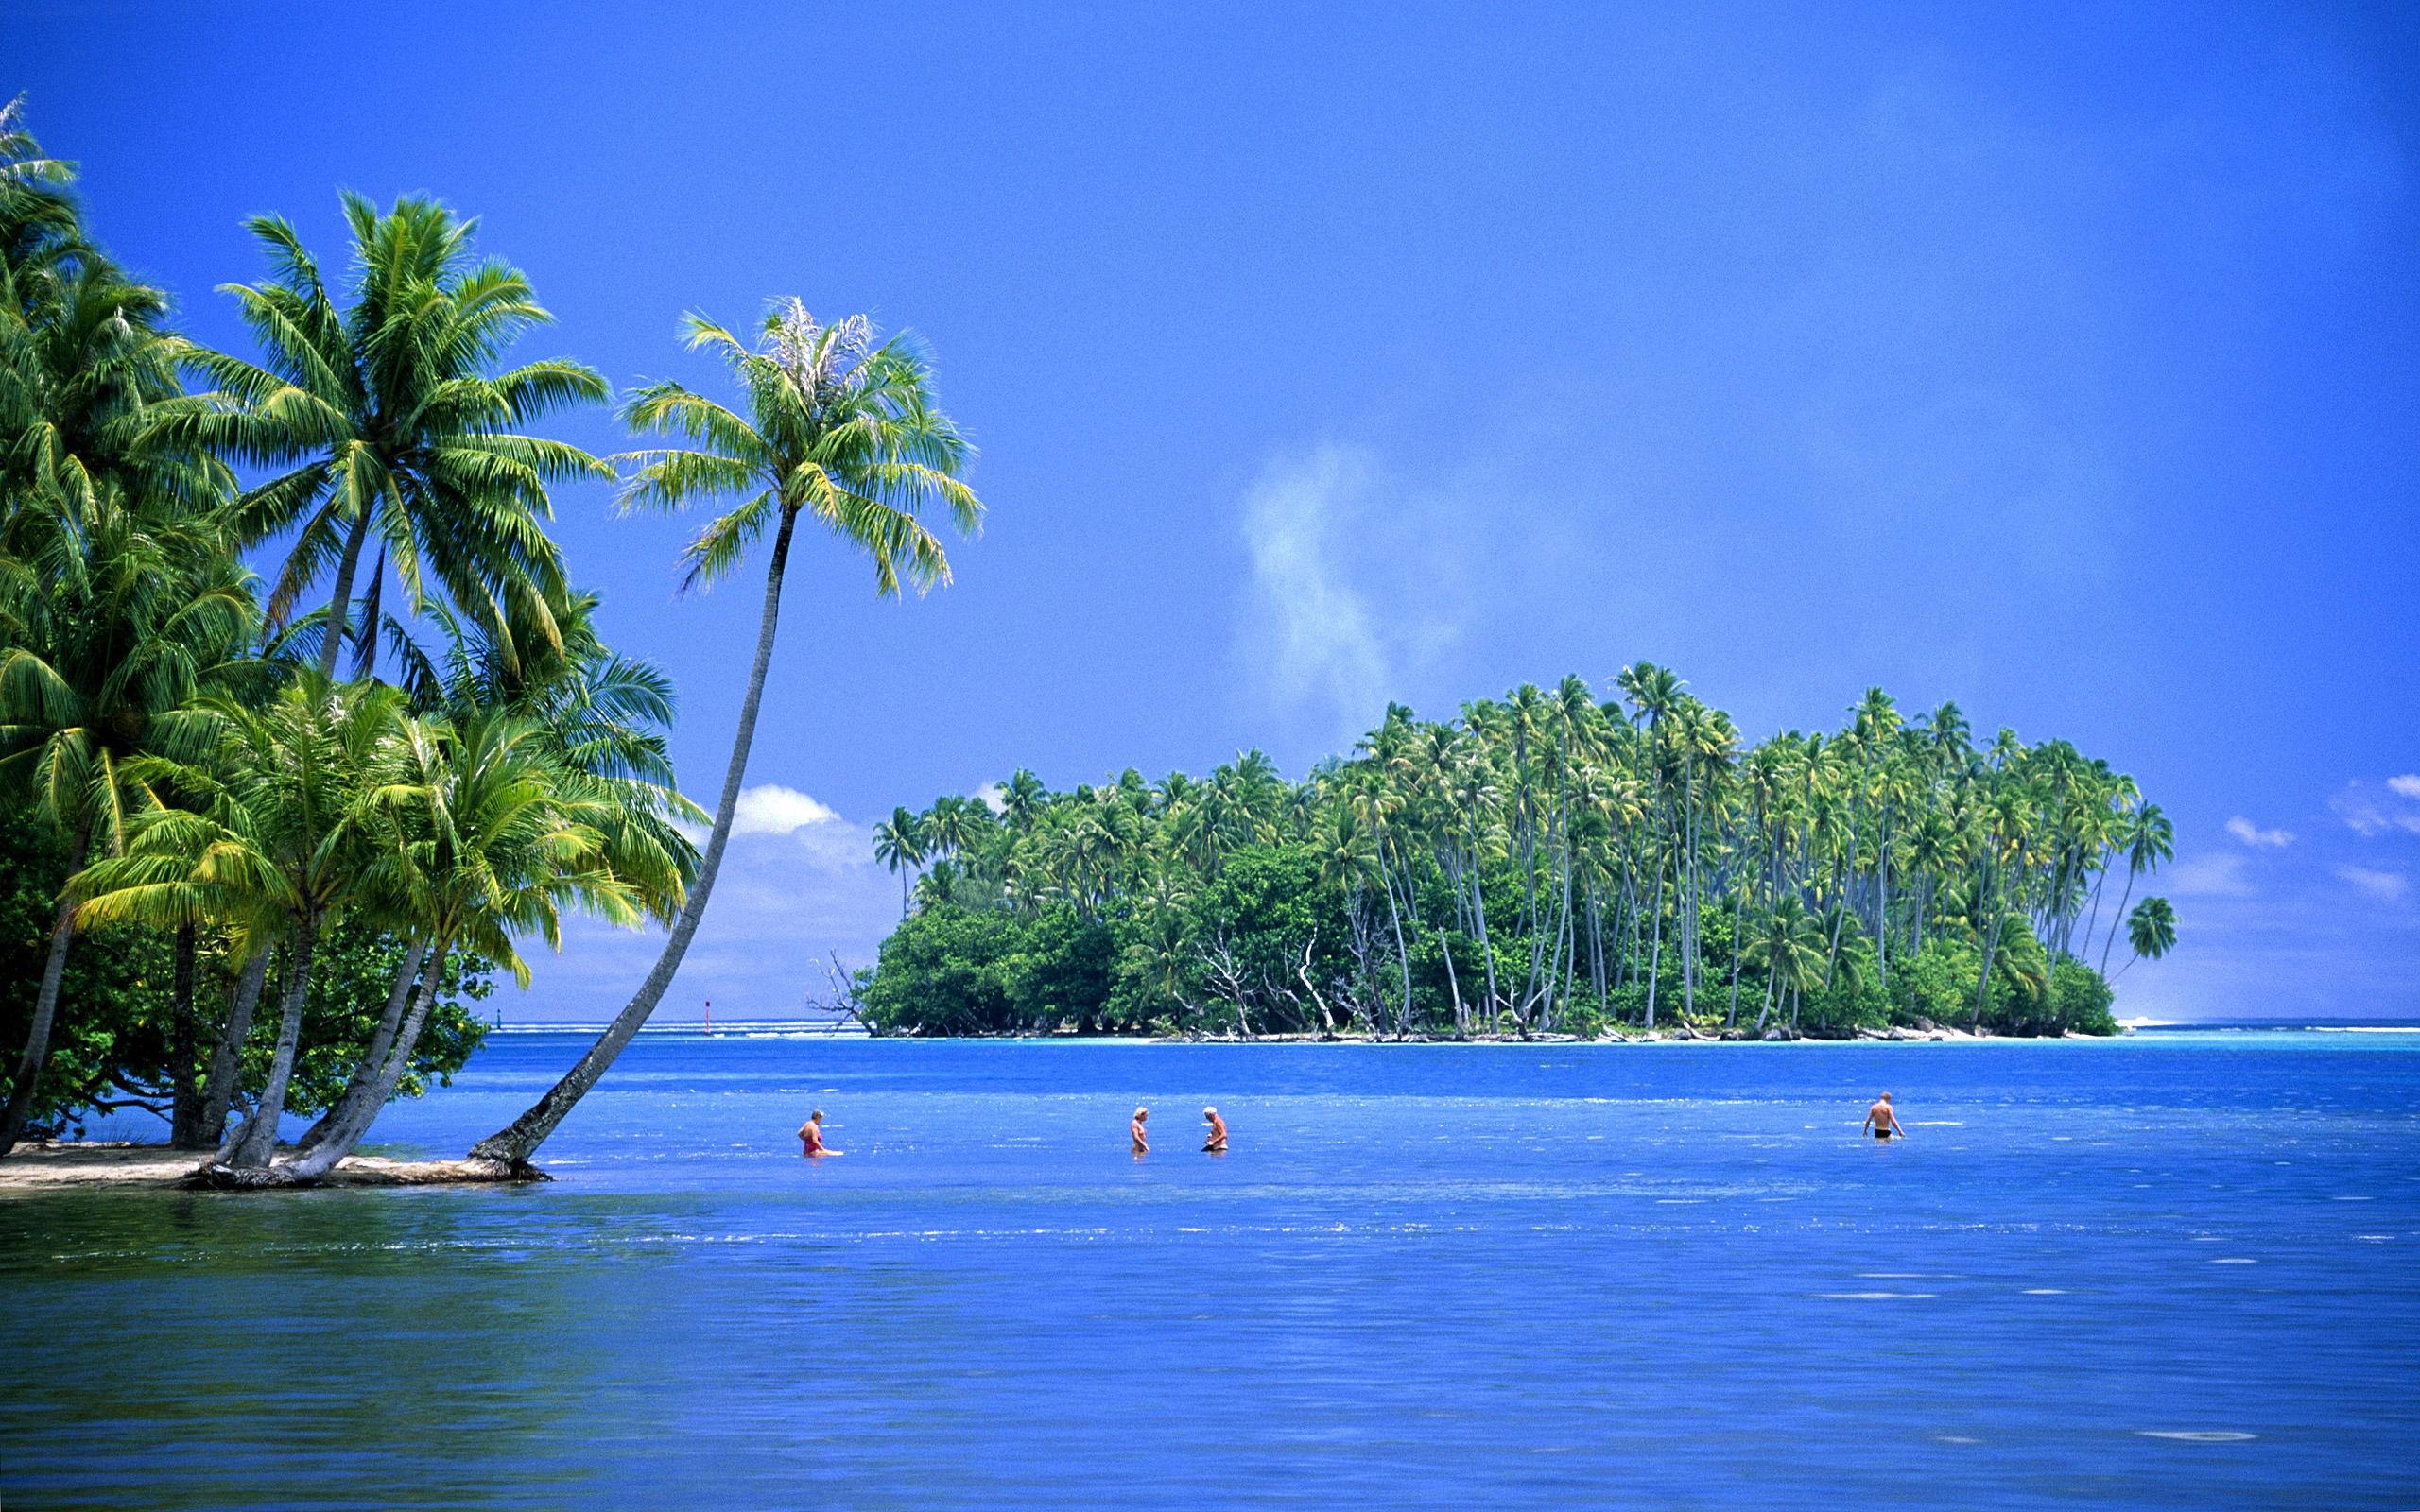 caribbean island postcard wallpaper - photo #14